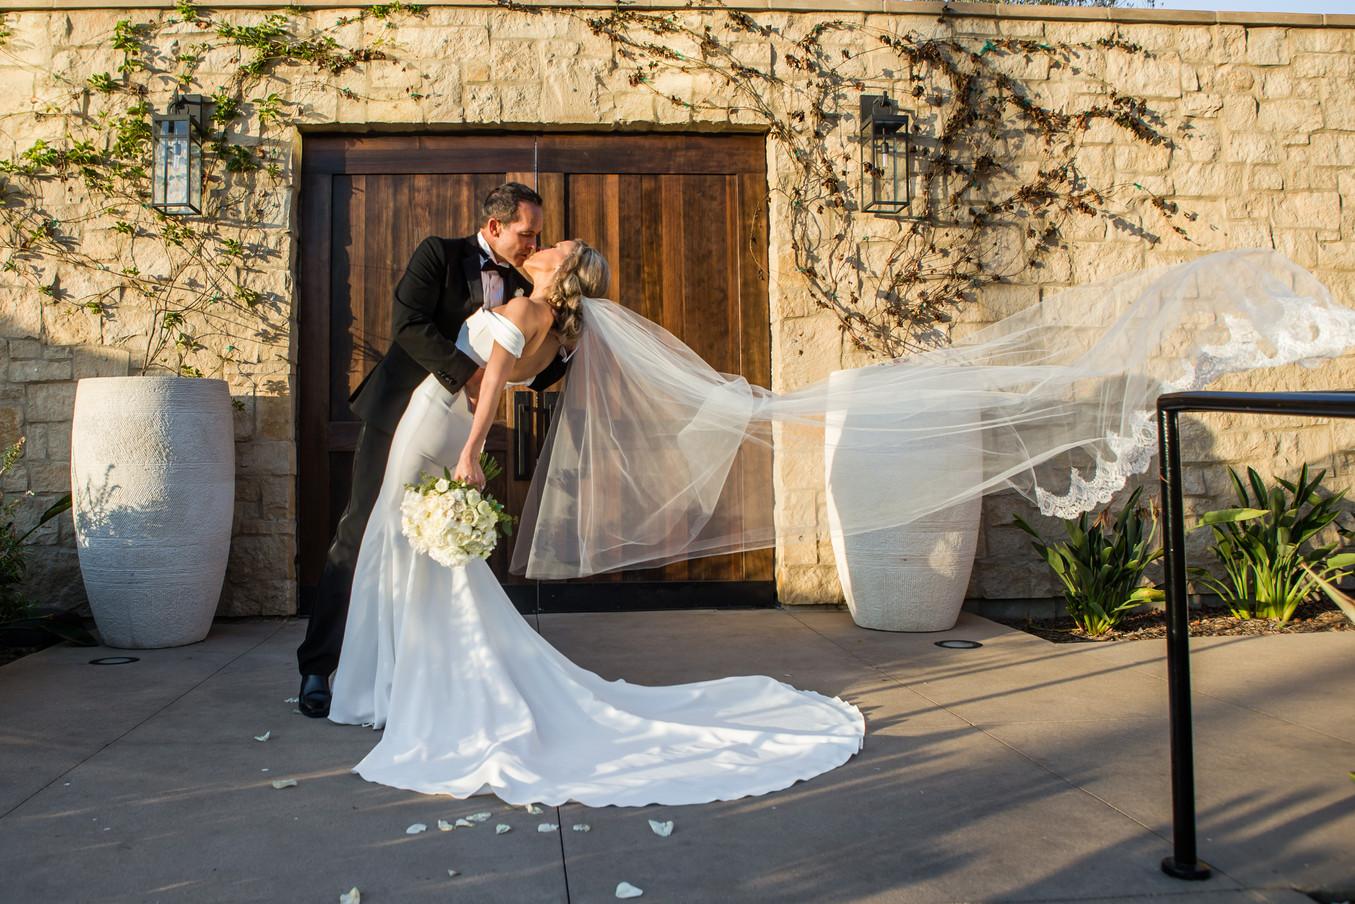 San Diego Wedding Photography, Berlynn Photography, Bride and Groom romantic portrait Fairbanks Ranch Country Club